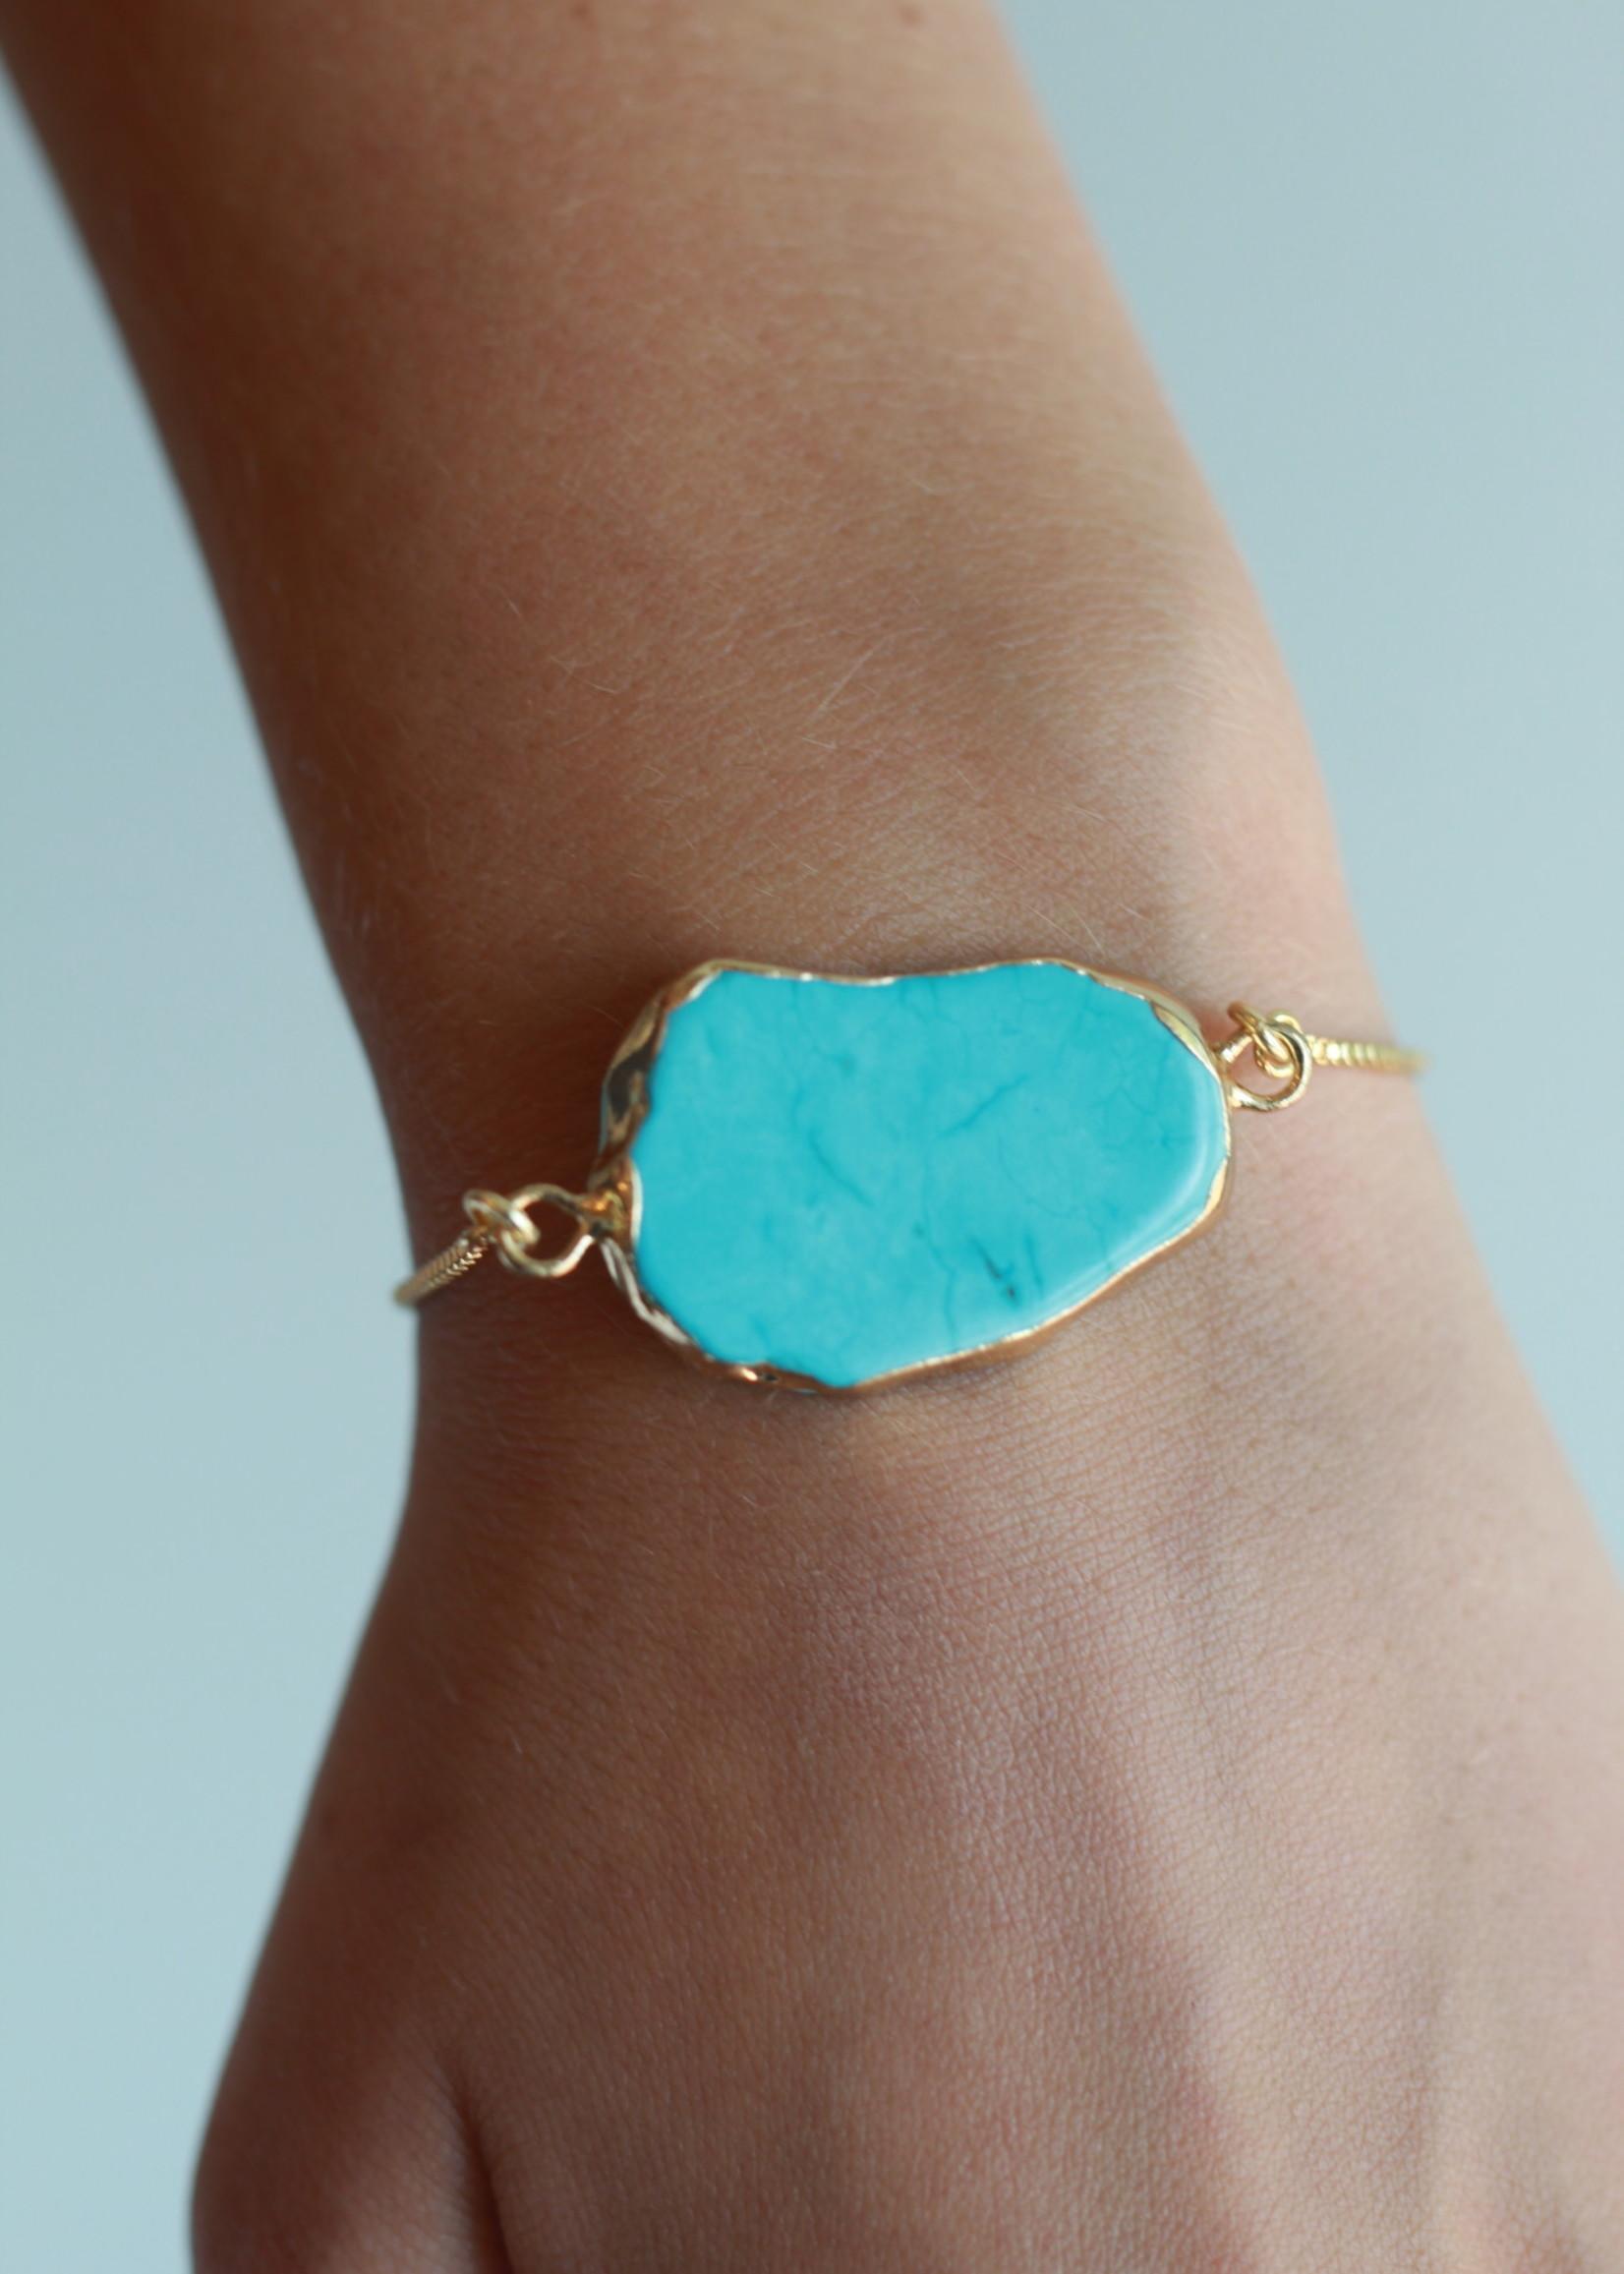 Allison Conway AC Turquoise Bracelet